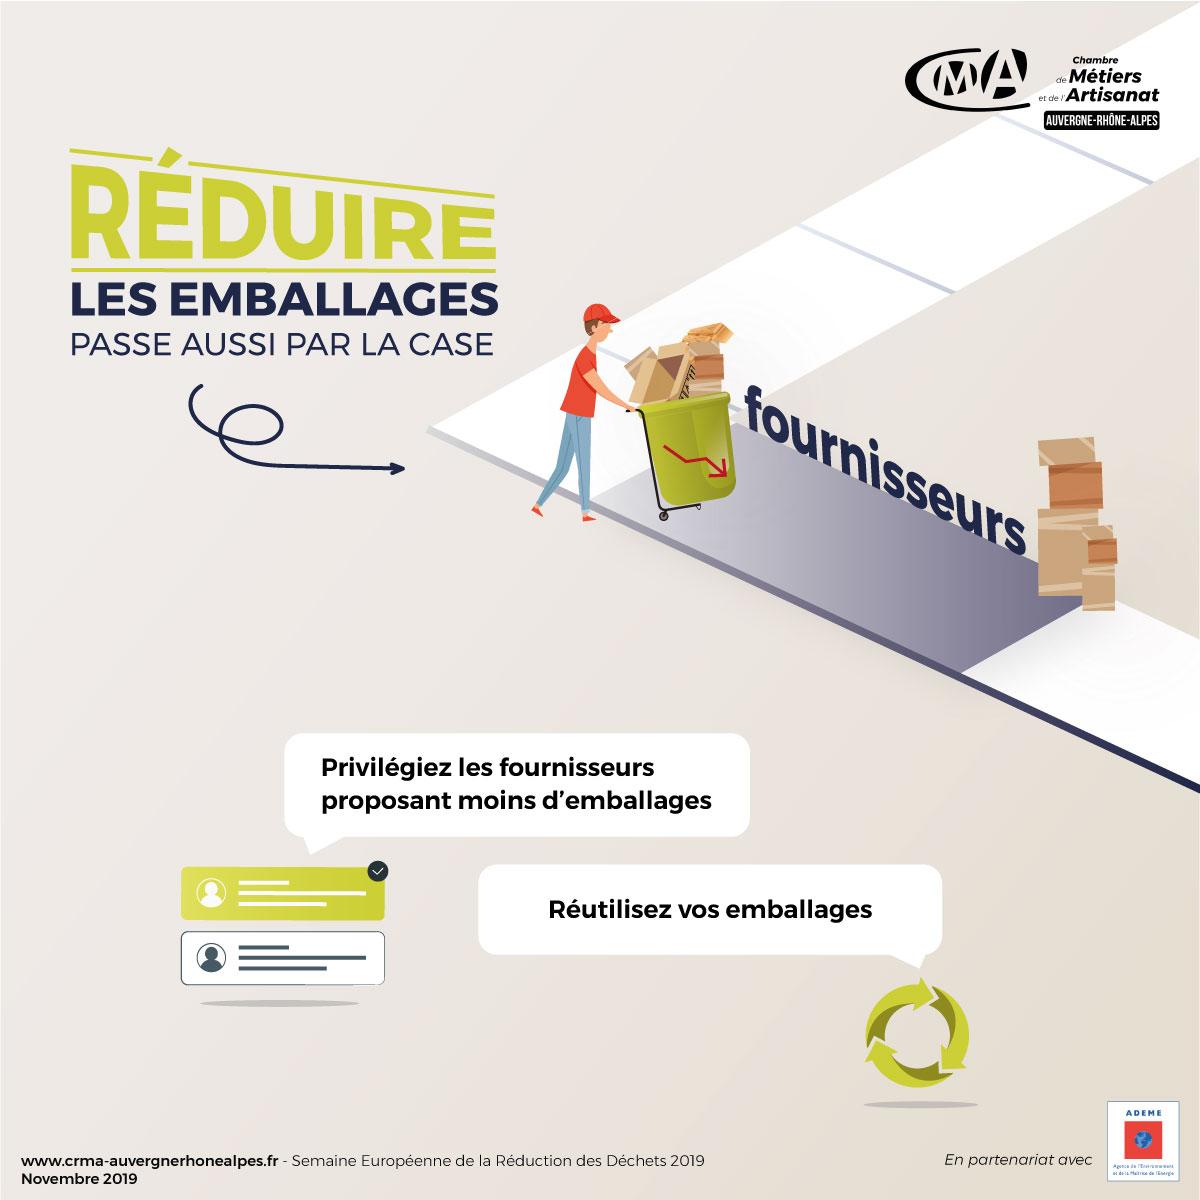 CRMA SERD Fournisseurs